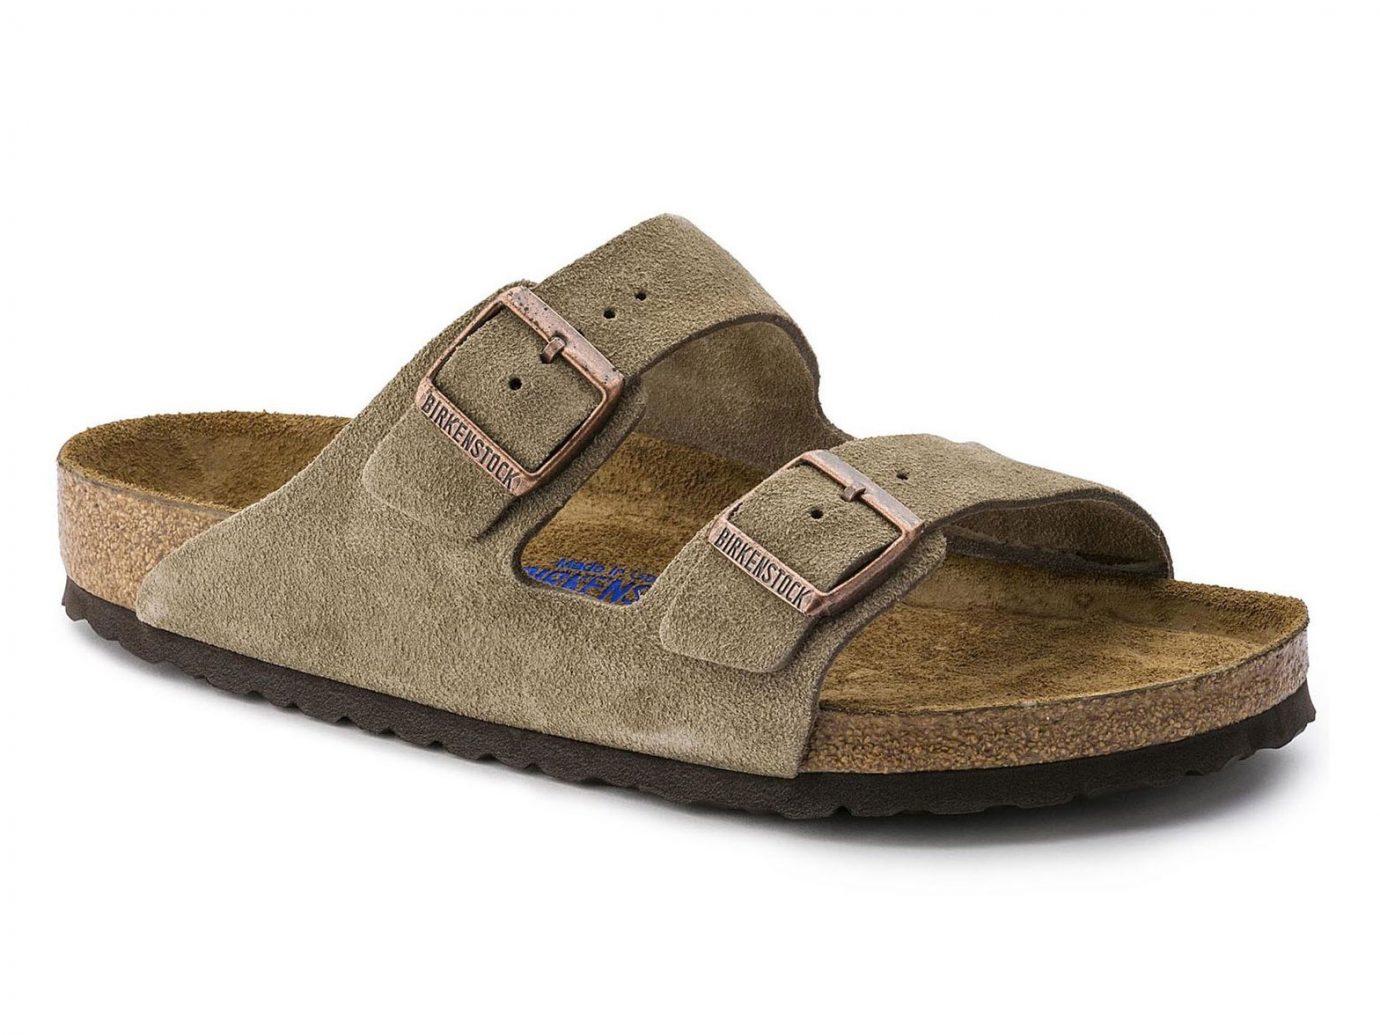 Birkenstock Arizona Soft Footbed in Suede Leather